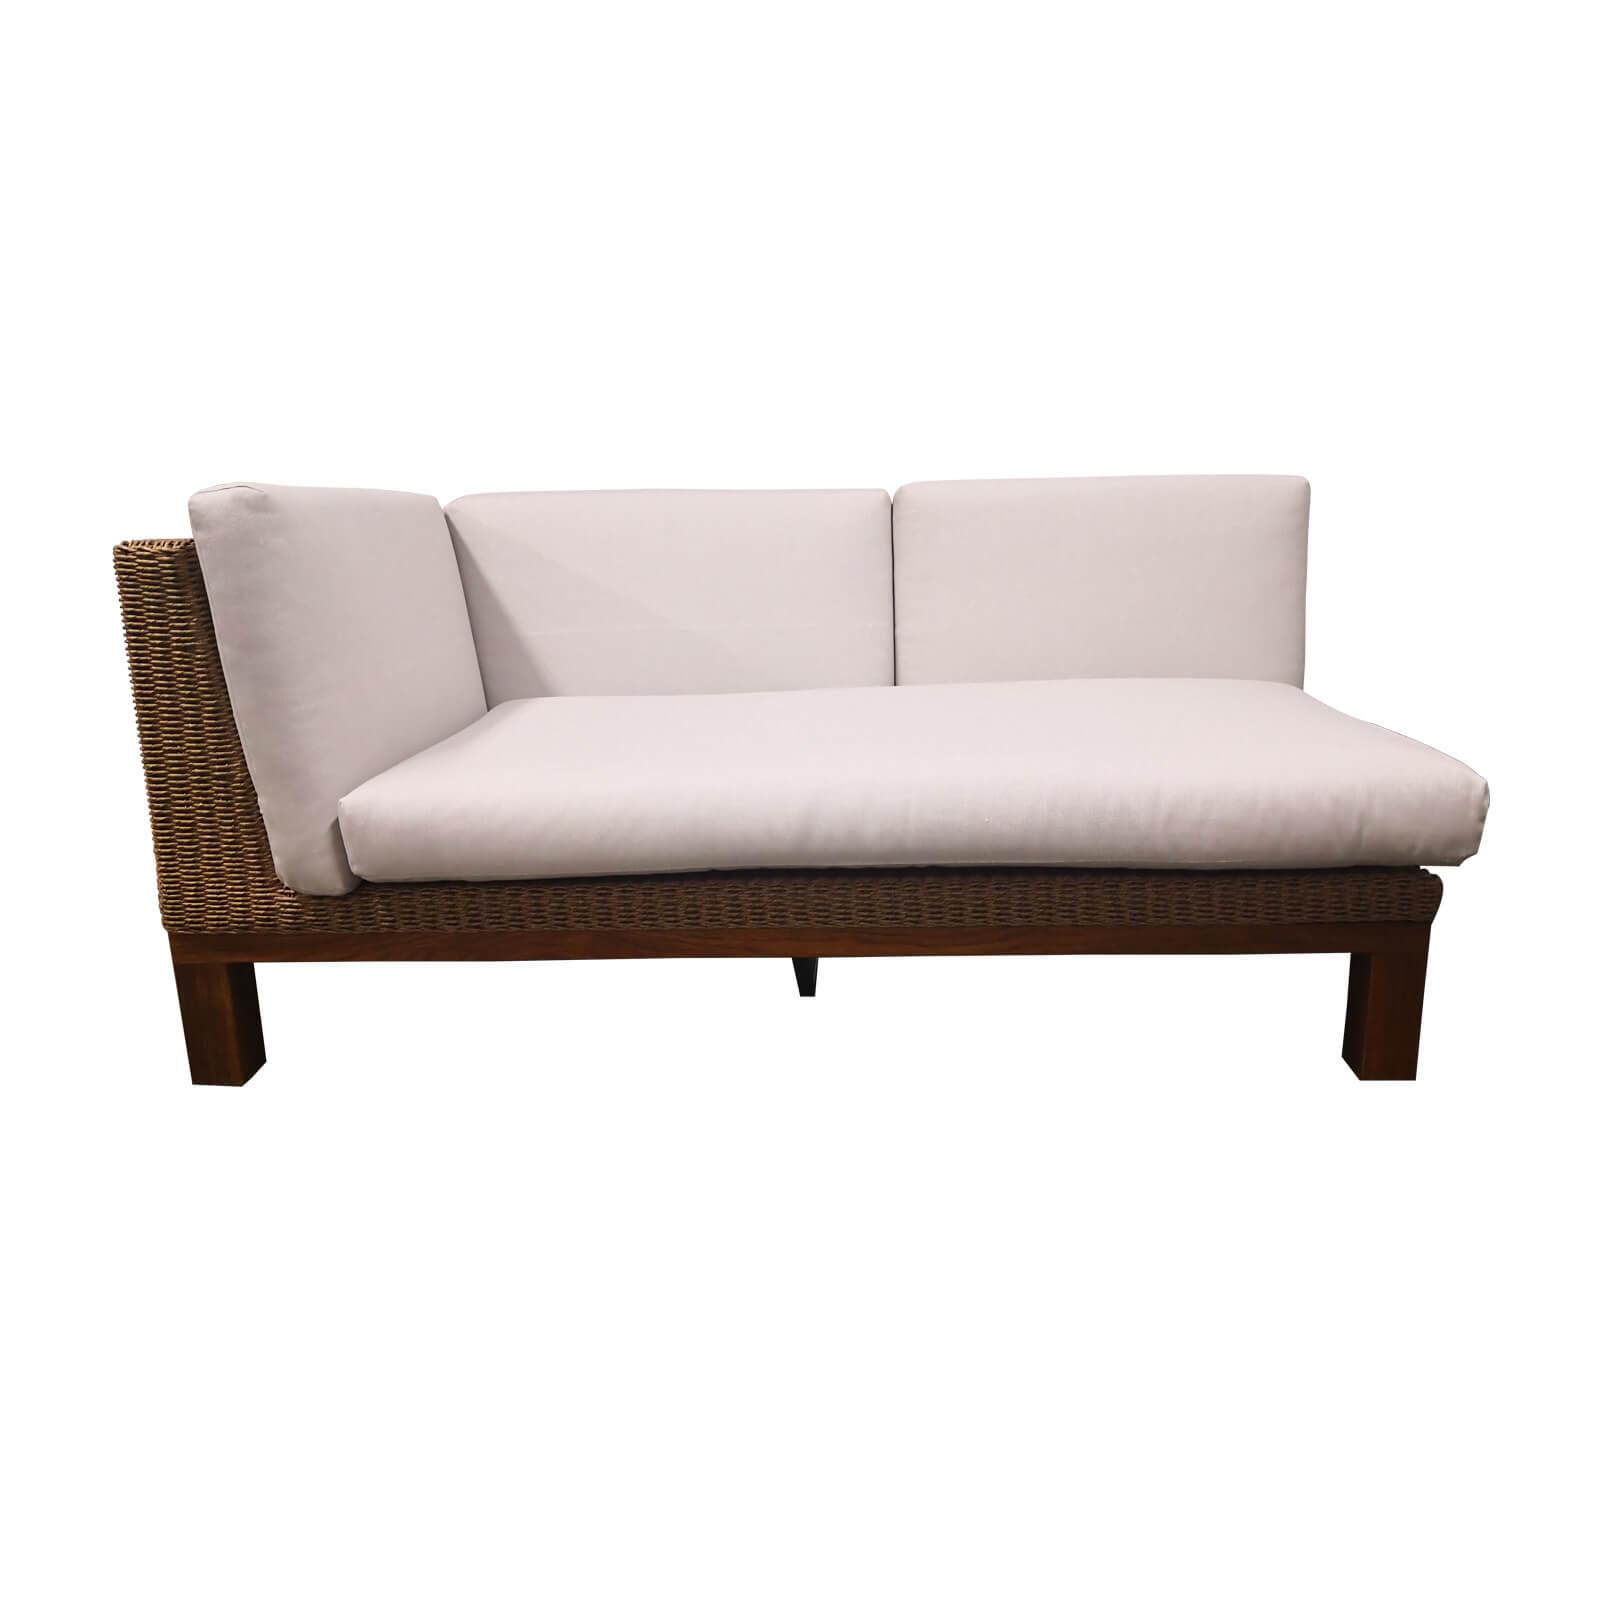 Two Design Lovers outdoor furniture teak and wicker sofa Osier Belle Joli